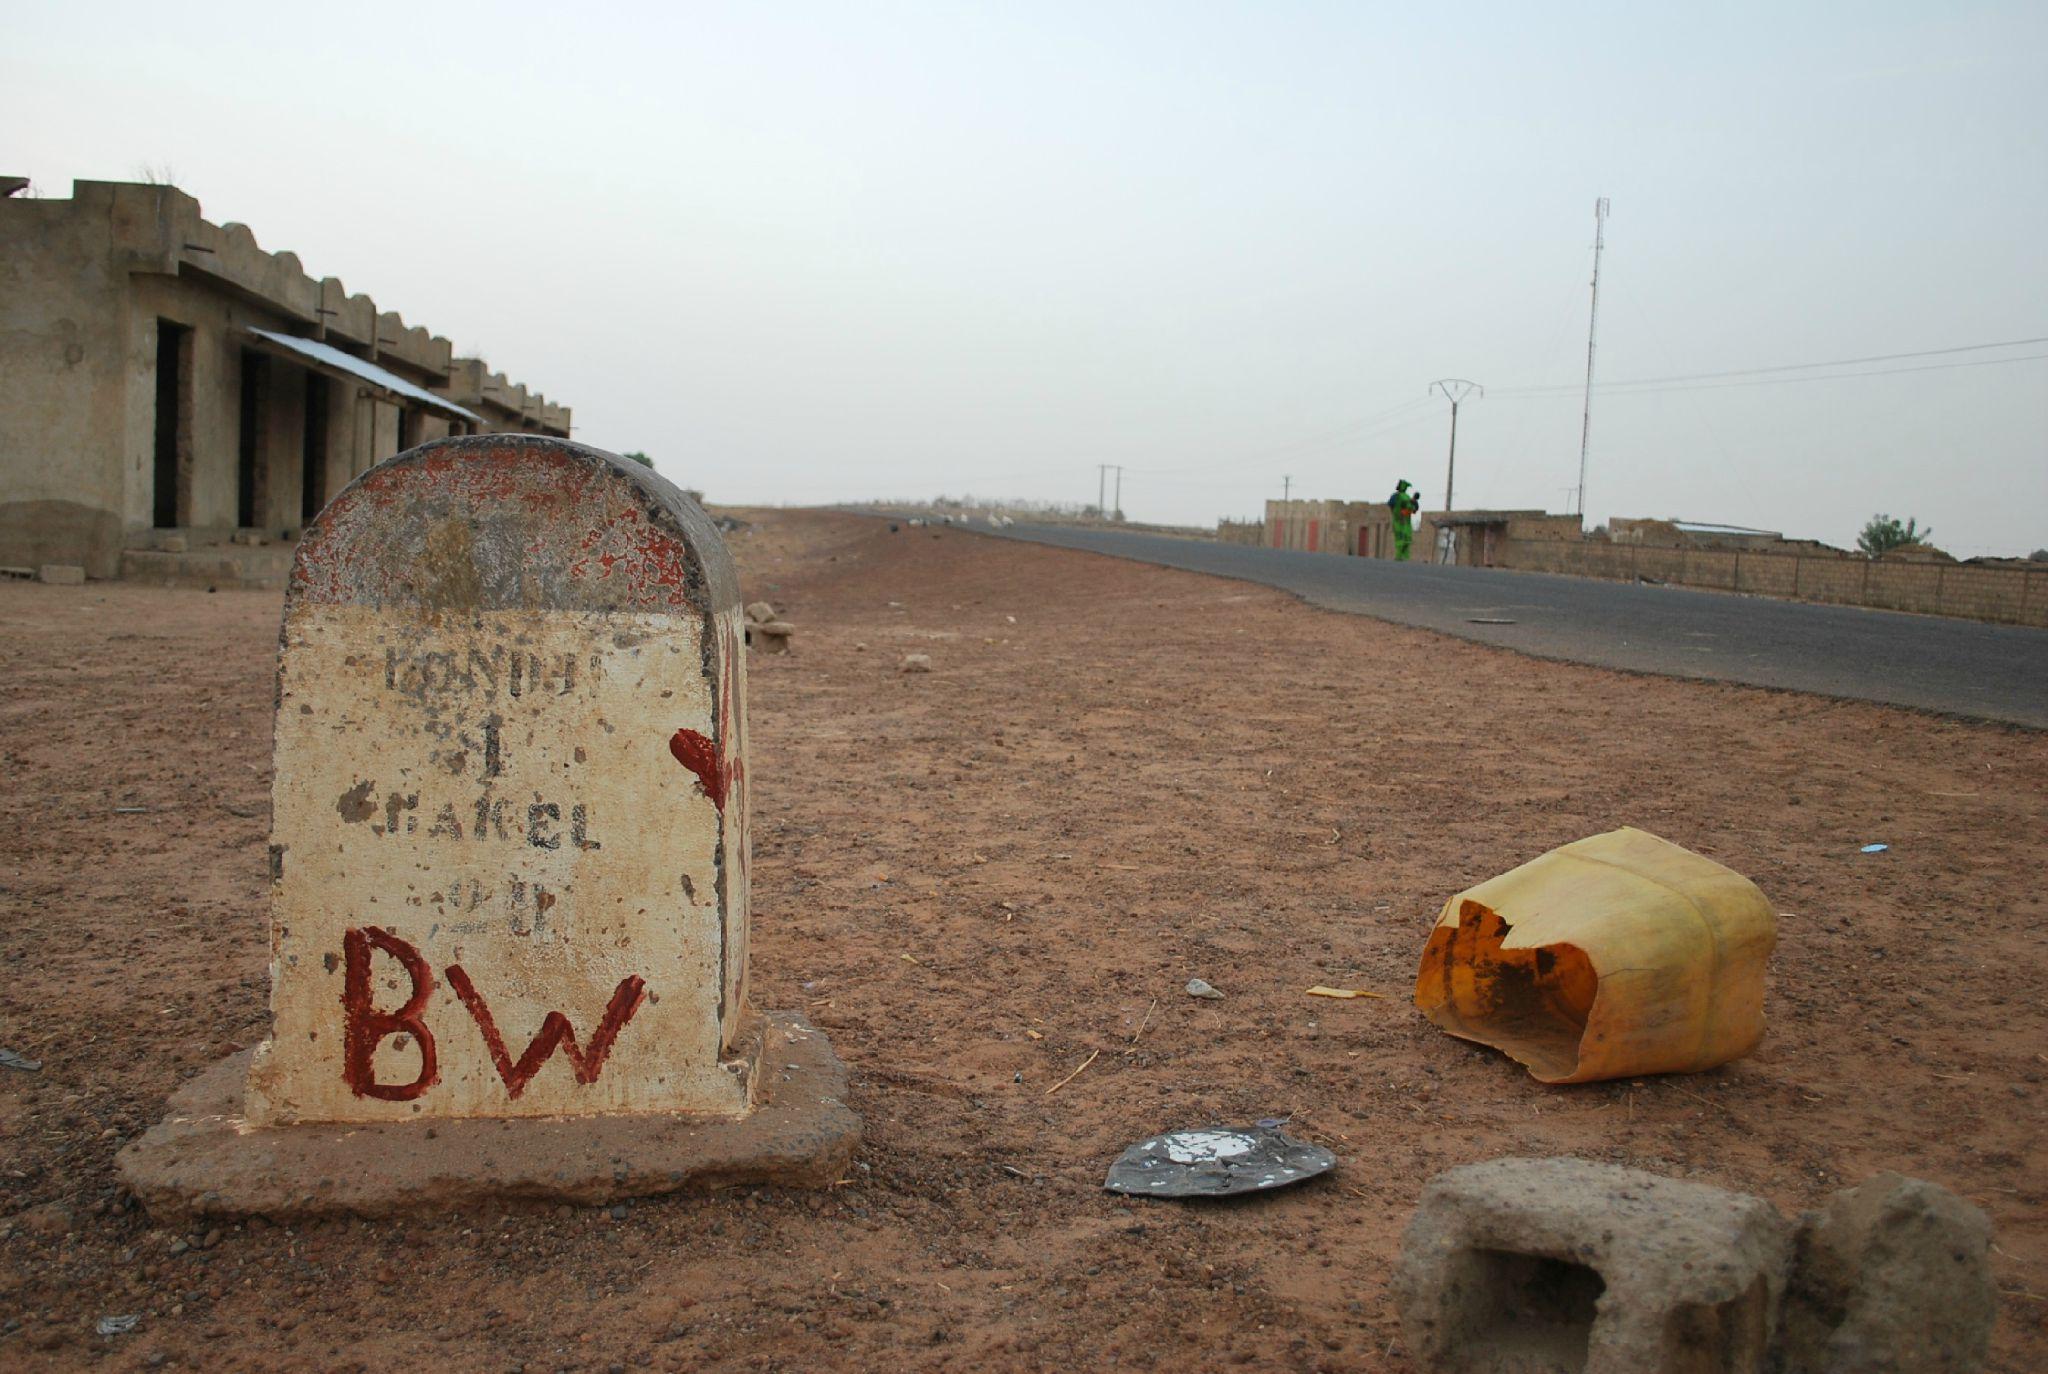 La Route de Bakel